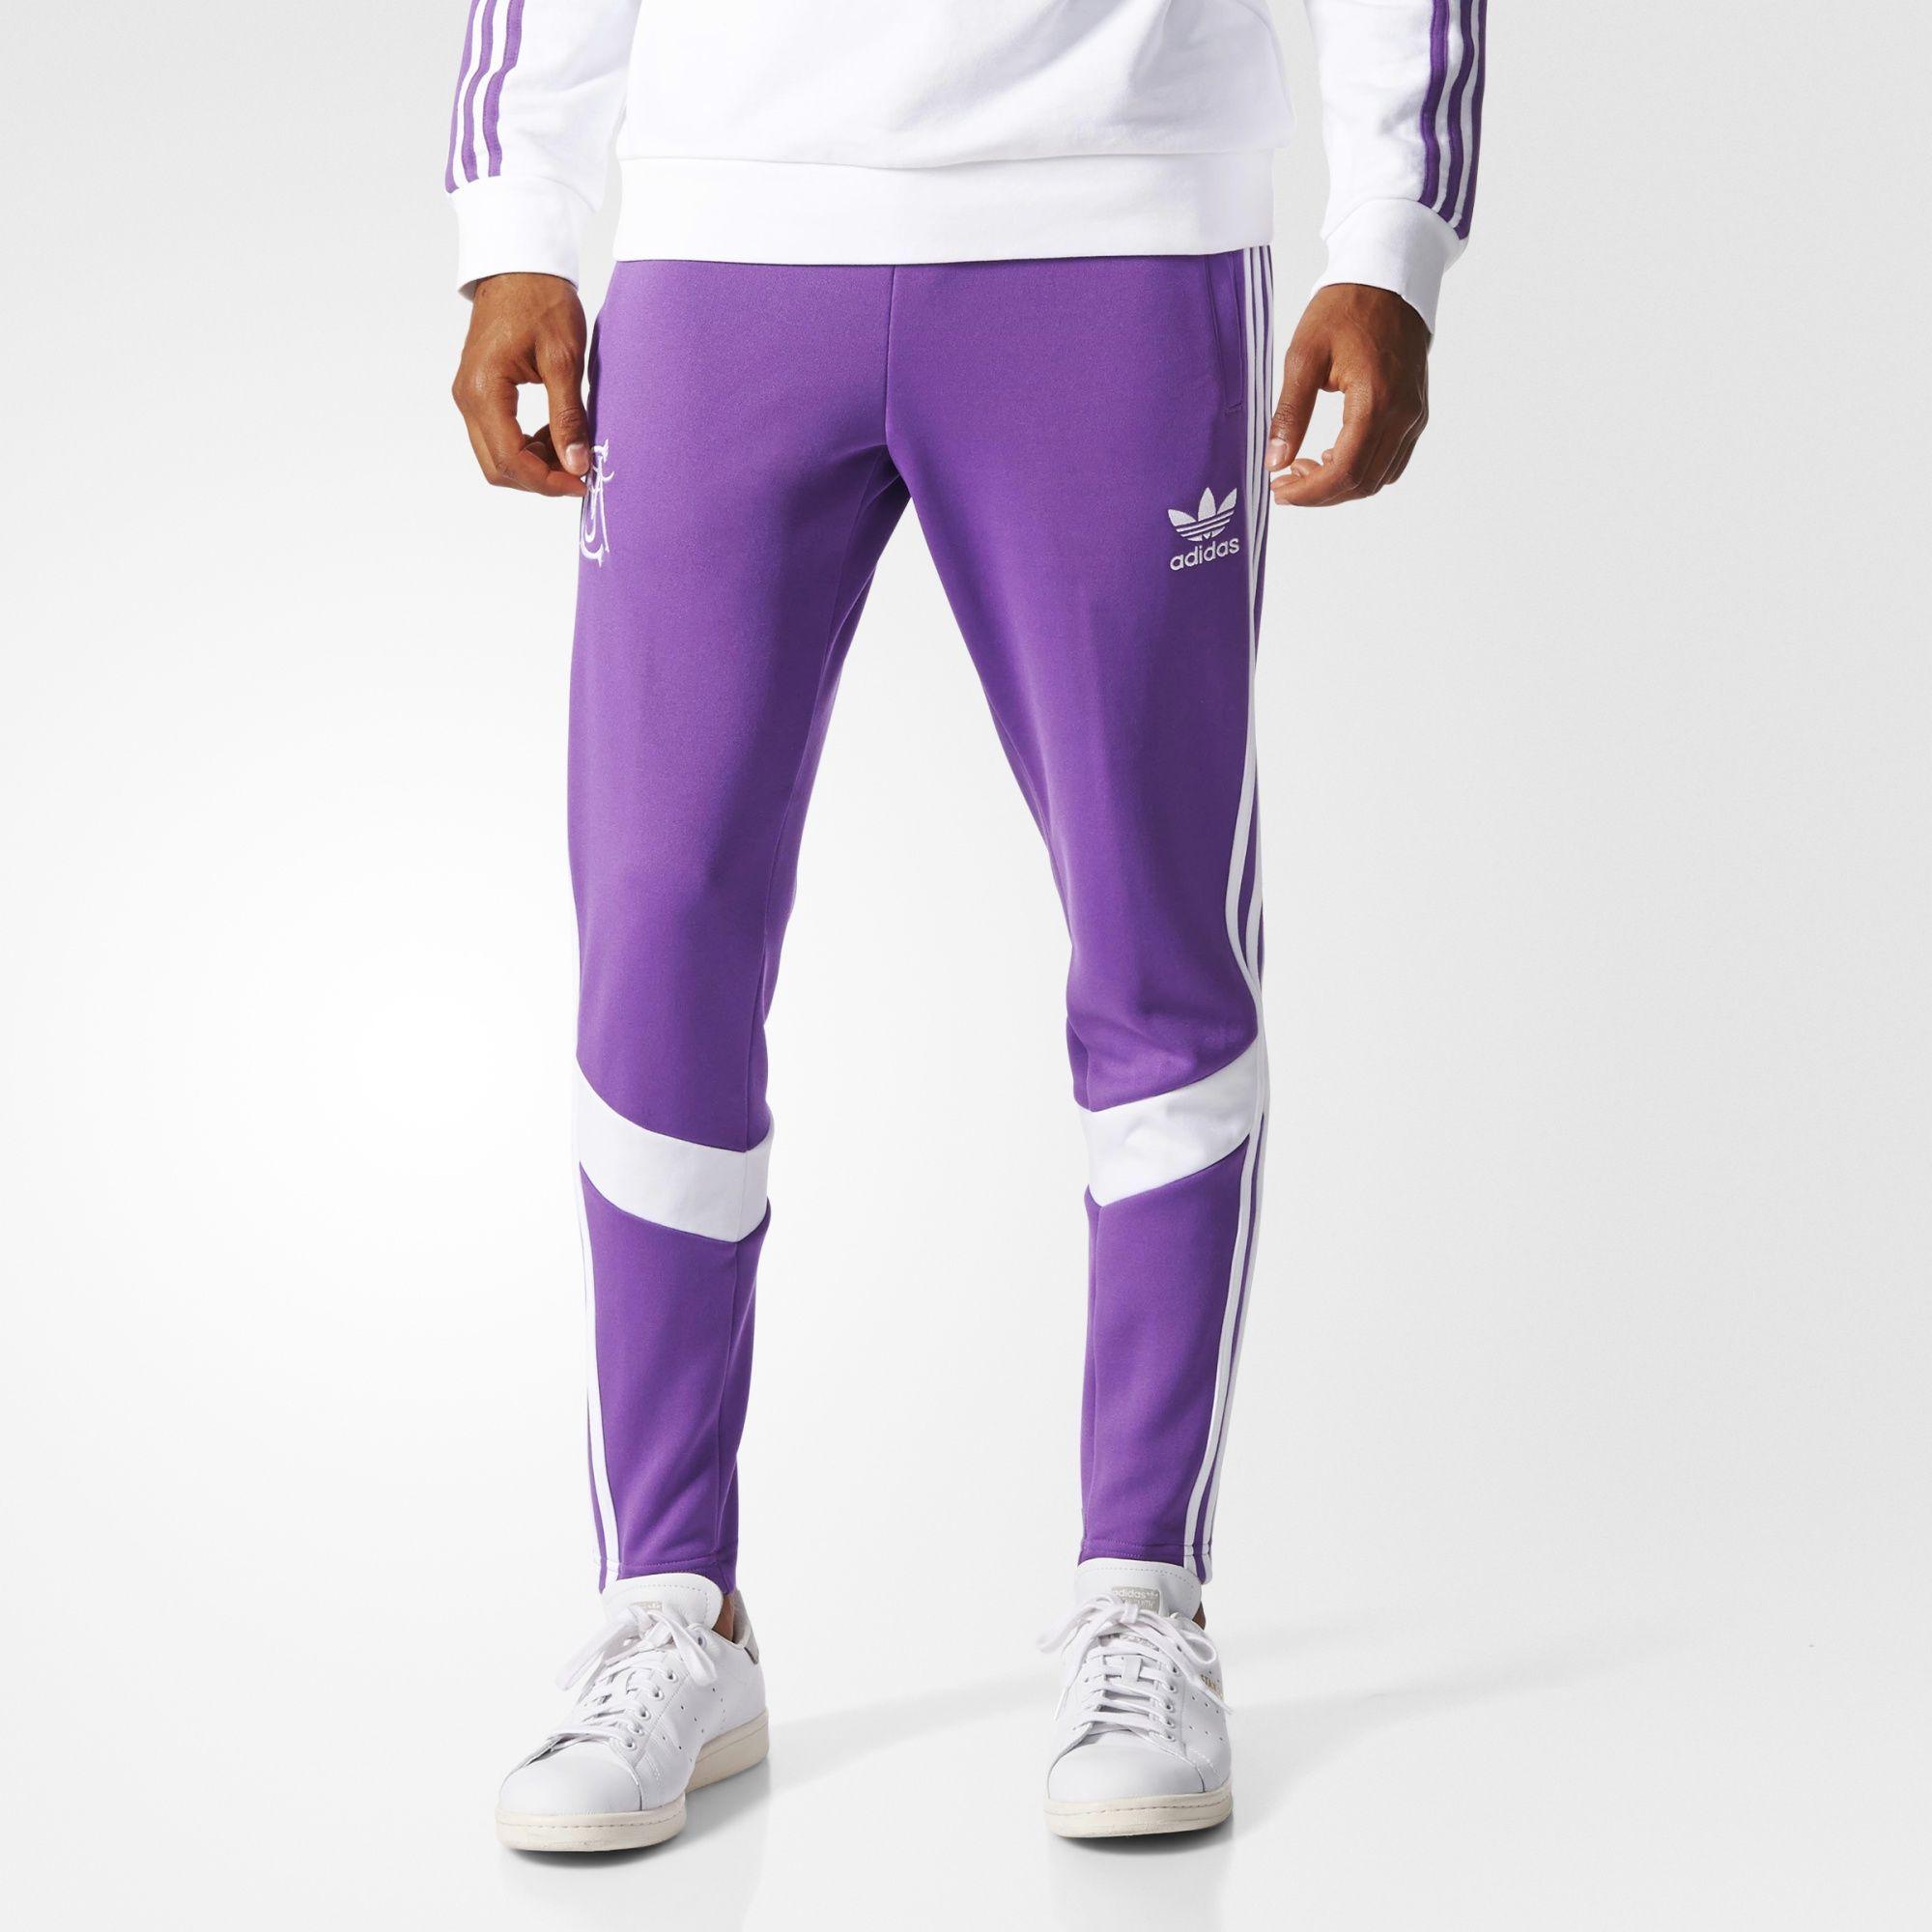 adidas Real Madrid Track Pants | Mens athletic pants